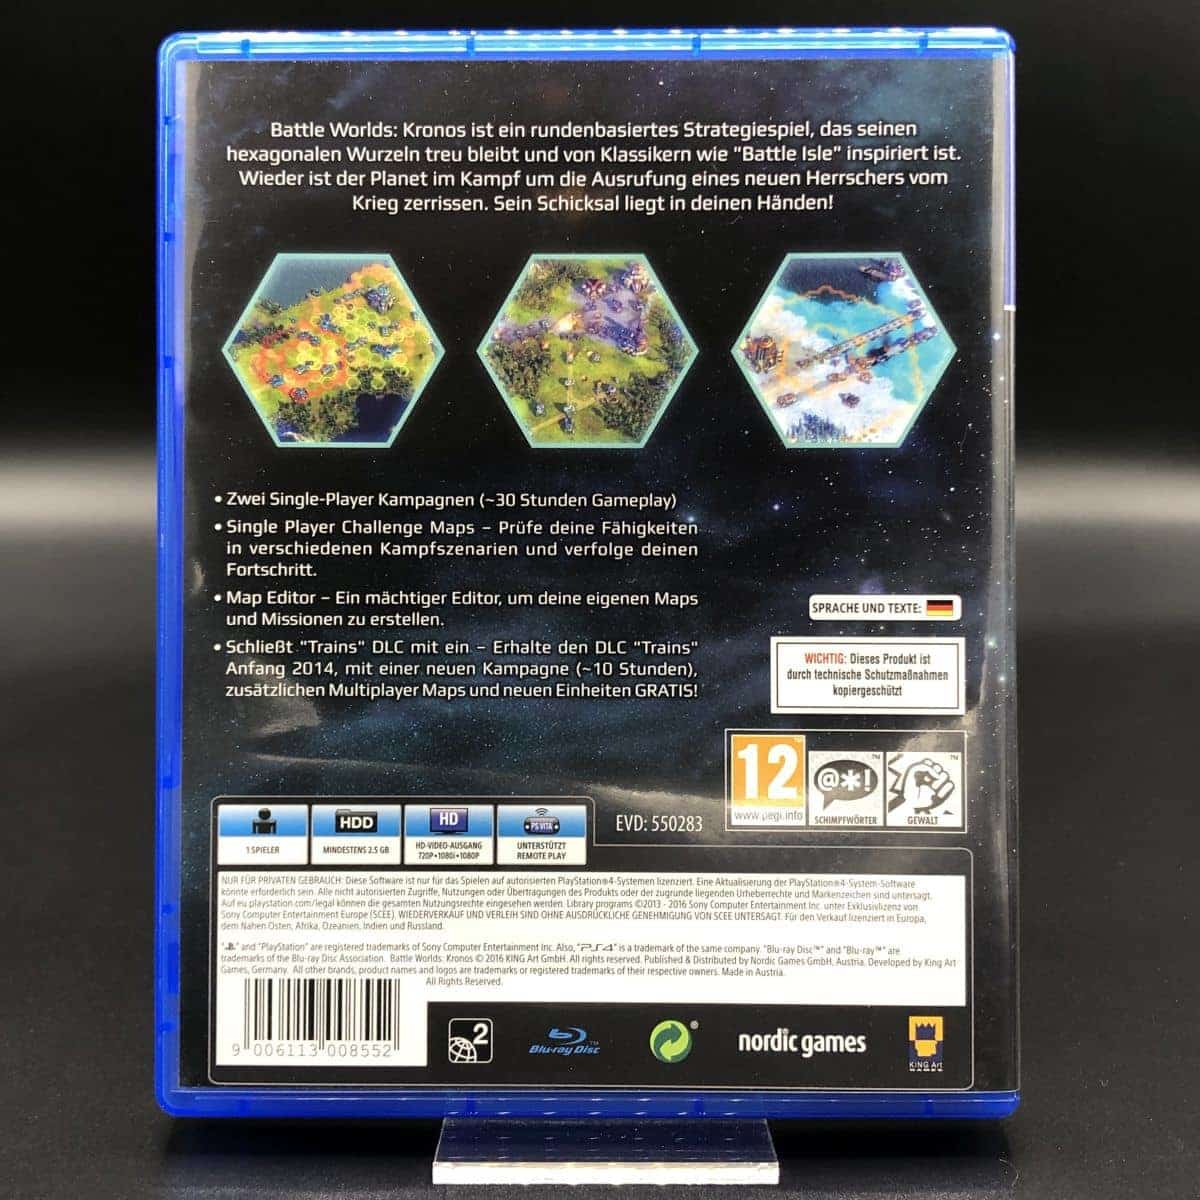 PS4 Battle Worlds Kronos (Sehr gut) Sony PlayStation 4